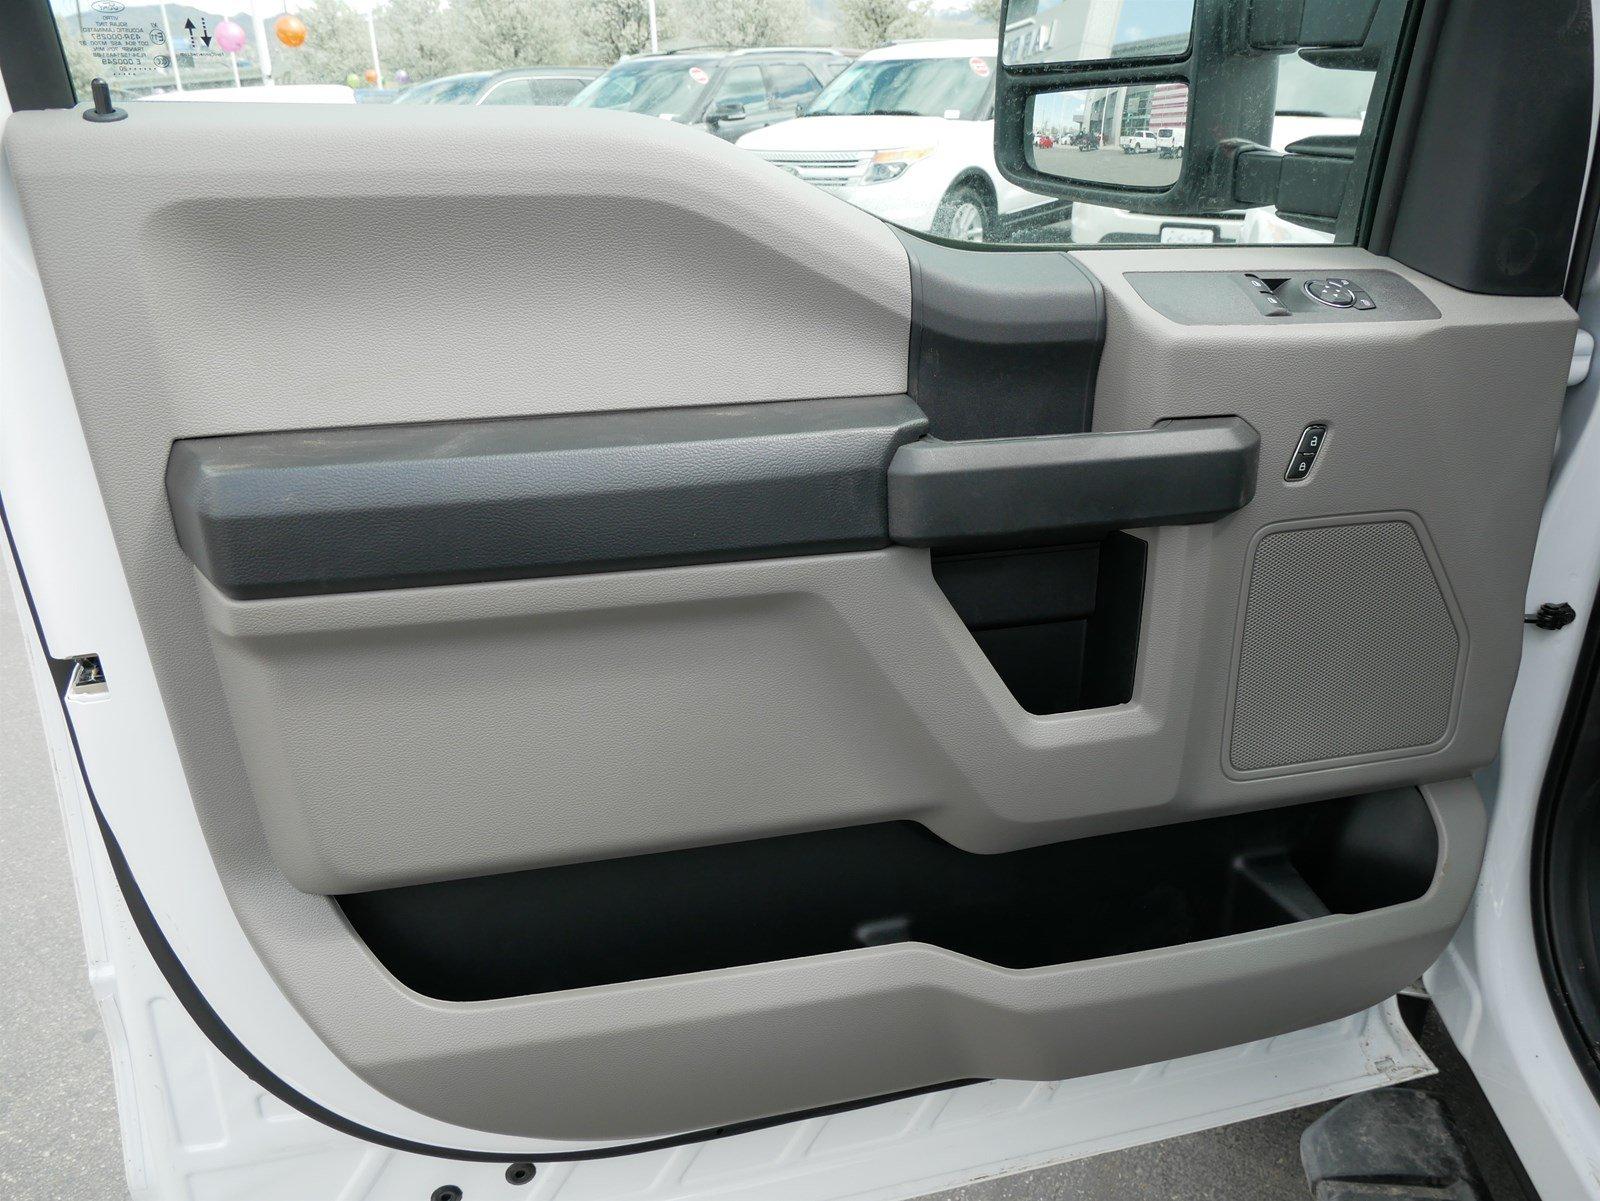 2020 F-550 Regular Cab DRW 4x4, Scelzi CTFB Contractor Body #63090 - photo 16